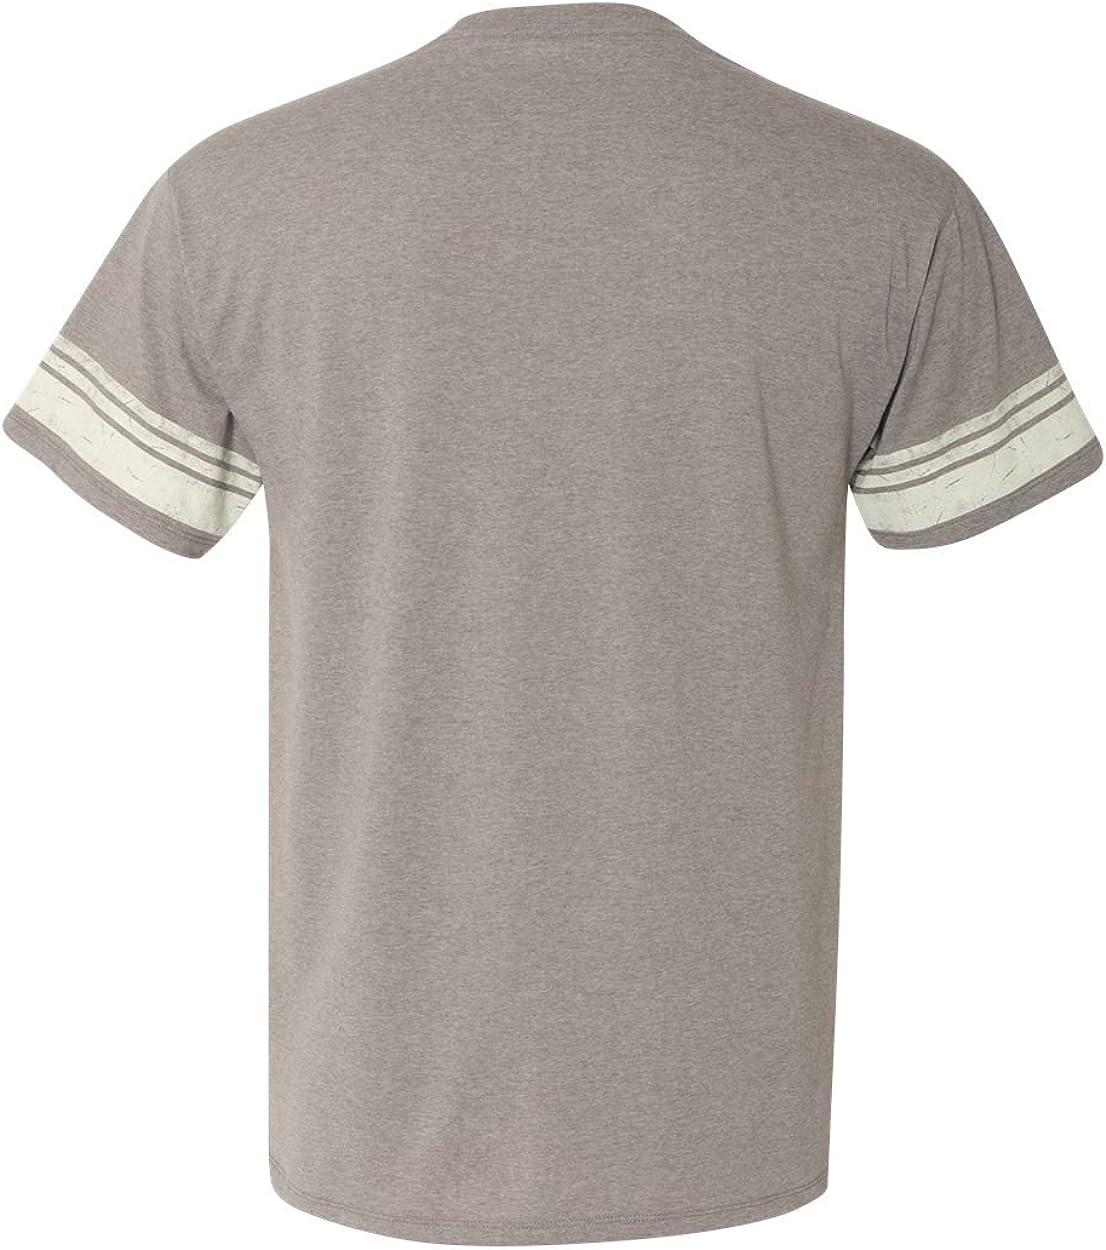 Champion Mens Authentic Originals Triblend Short Sleeve Varsity Tee Shirt